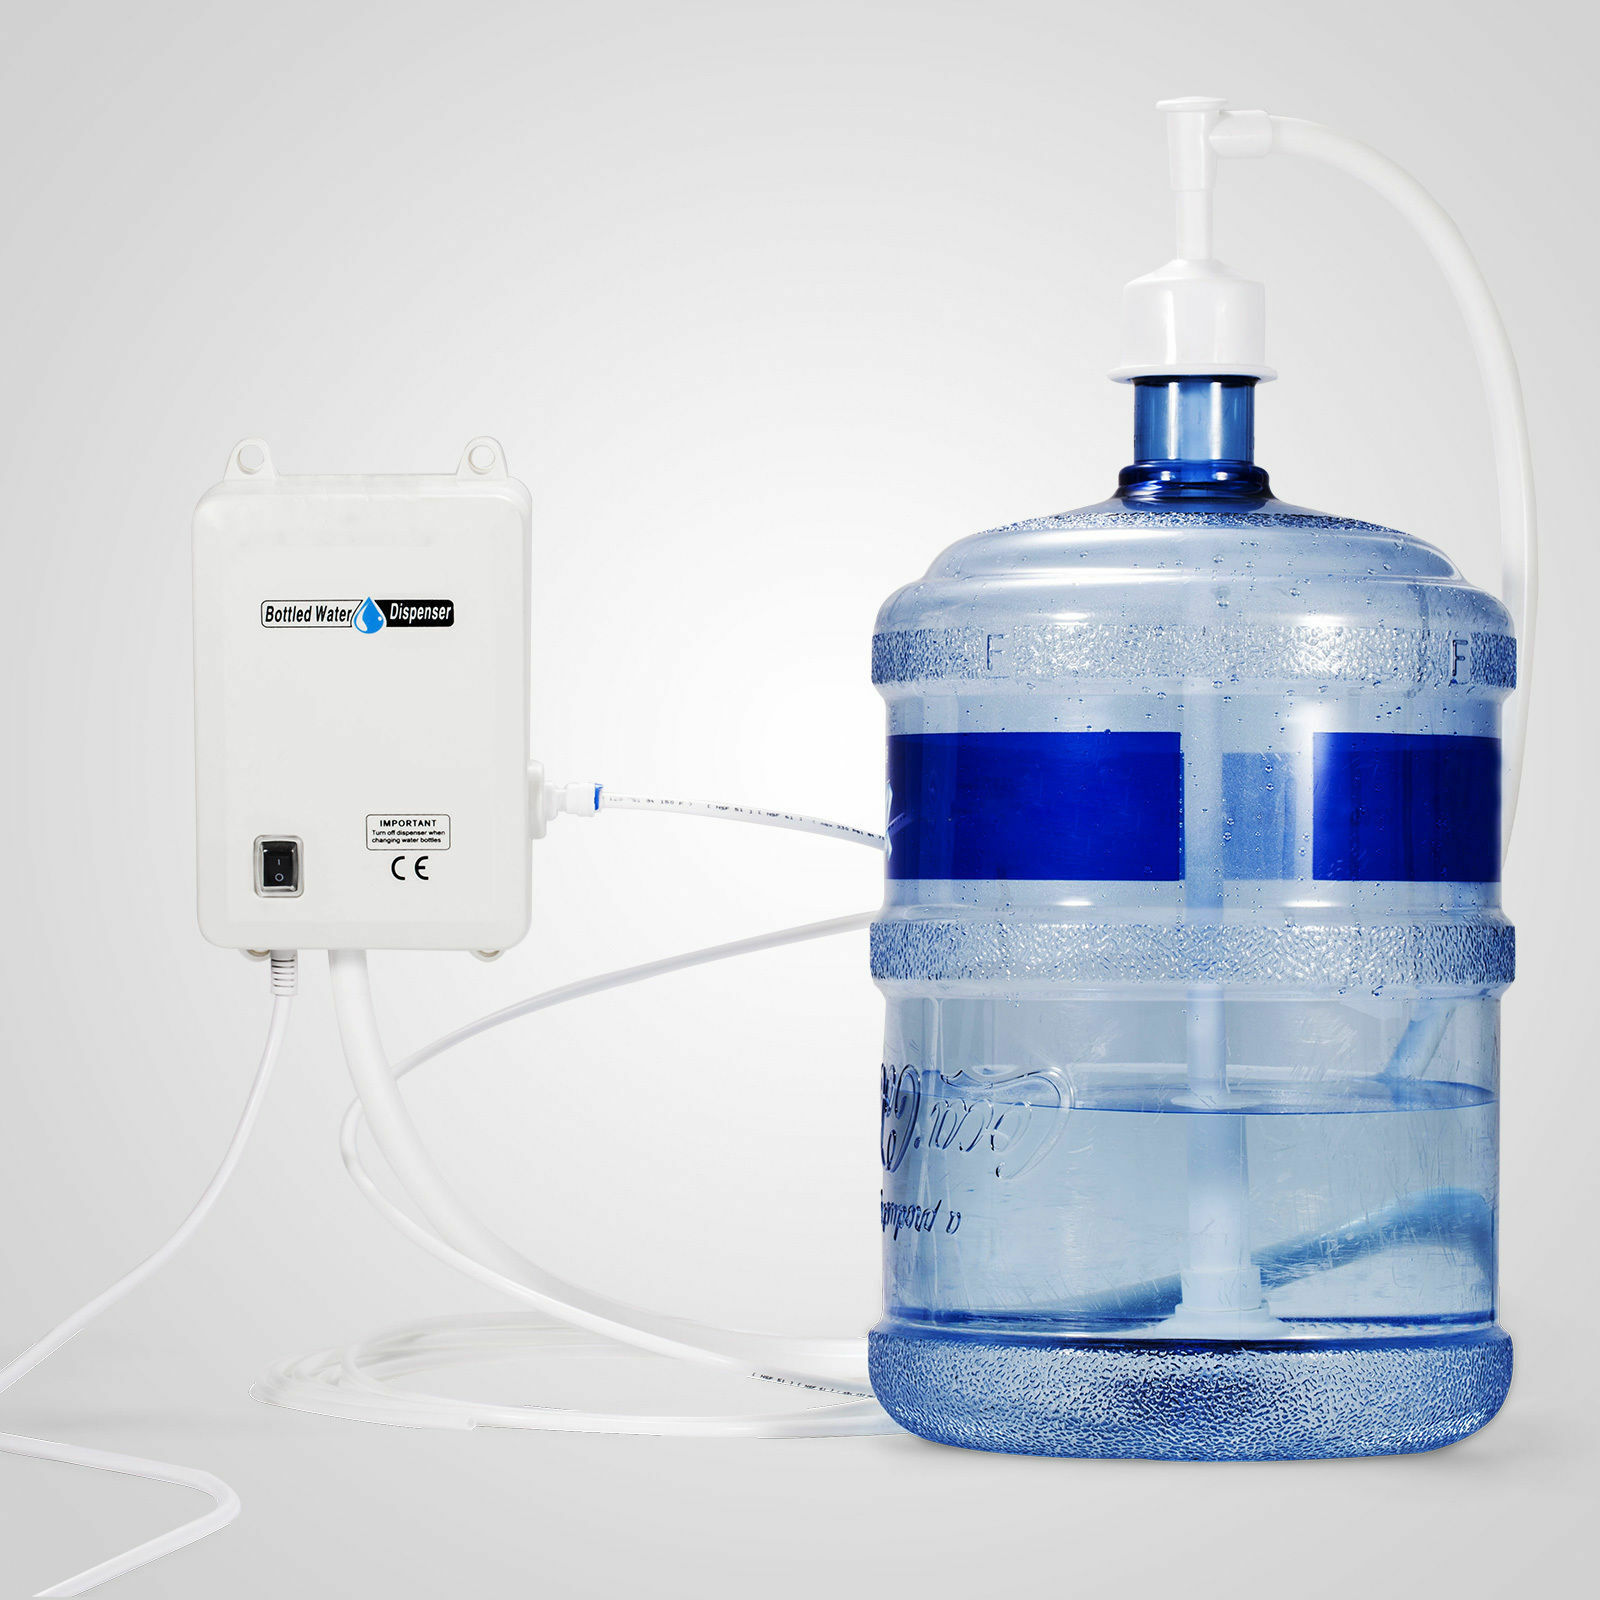 220 V AC l'eau embouteillée Dispensing Pump System remplace Bunn Flojet F Ice Maker UK